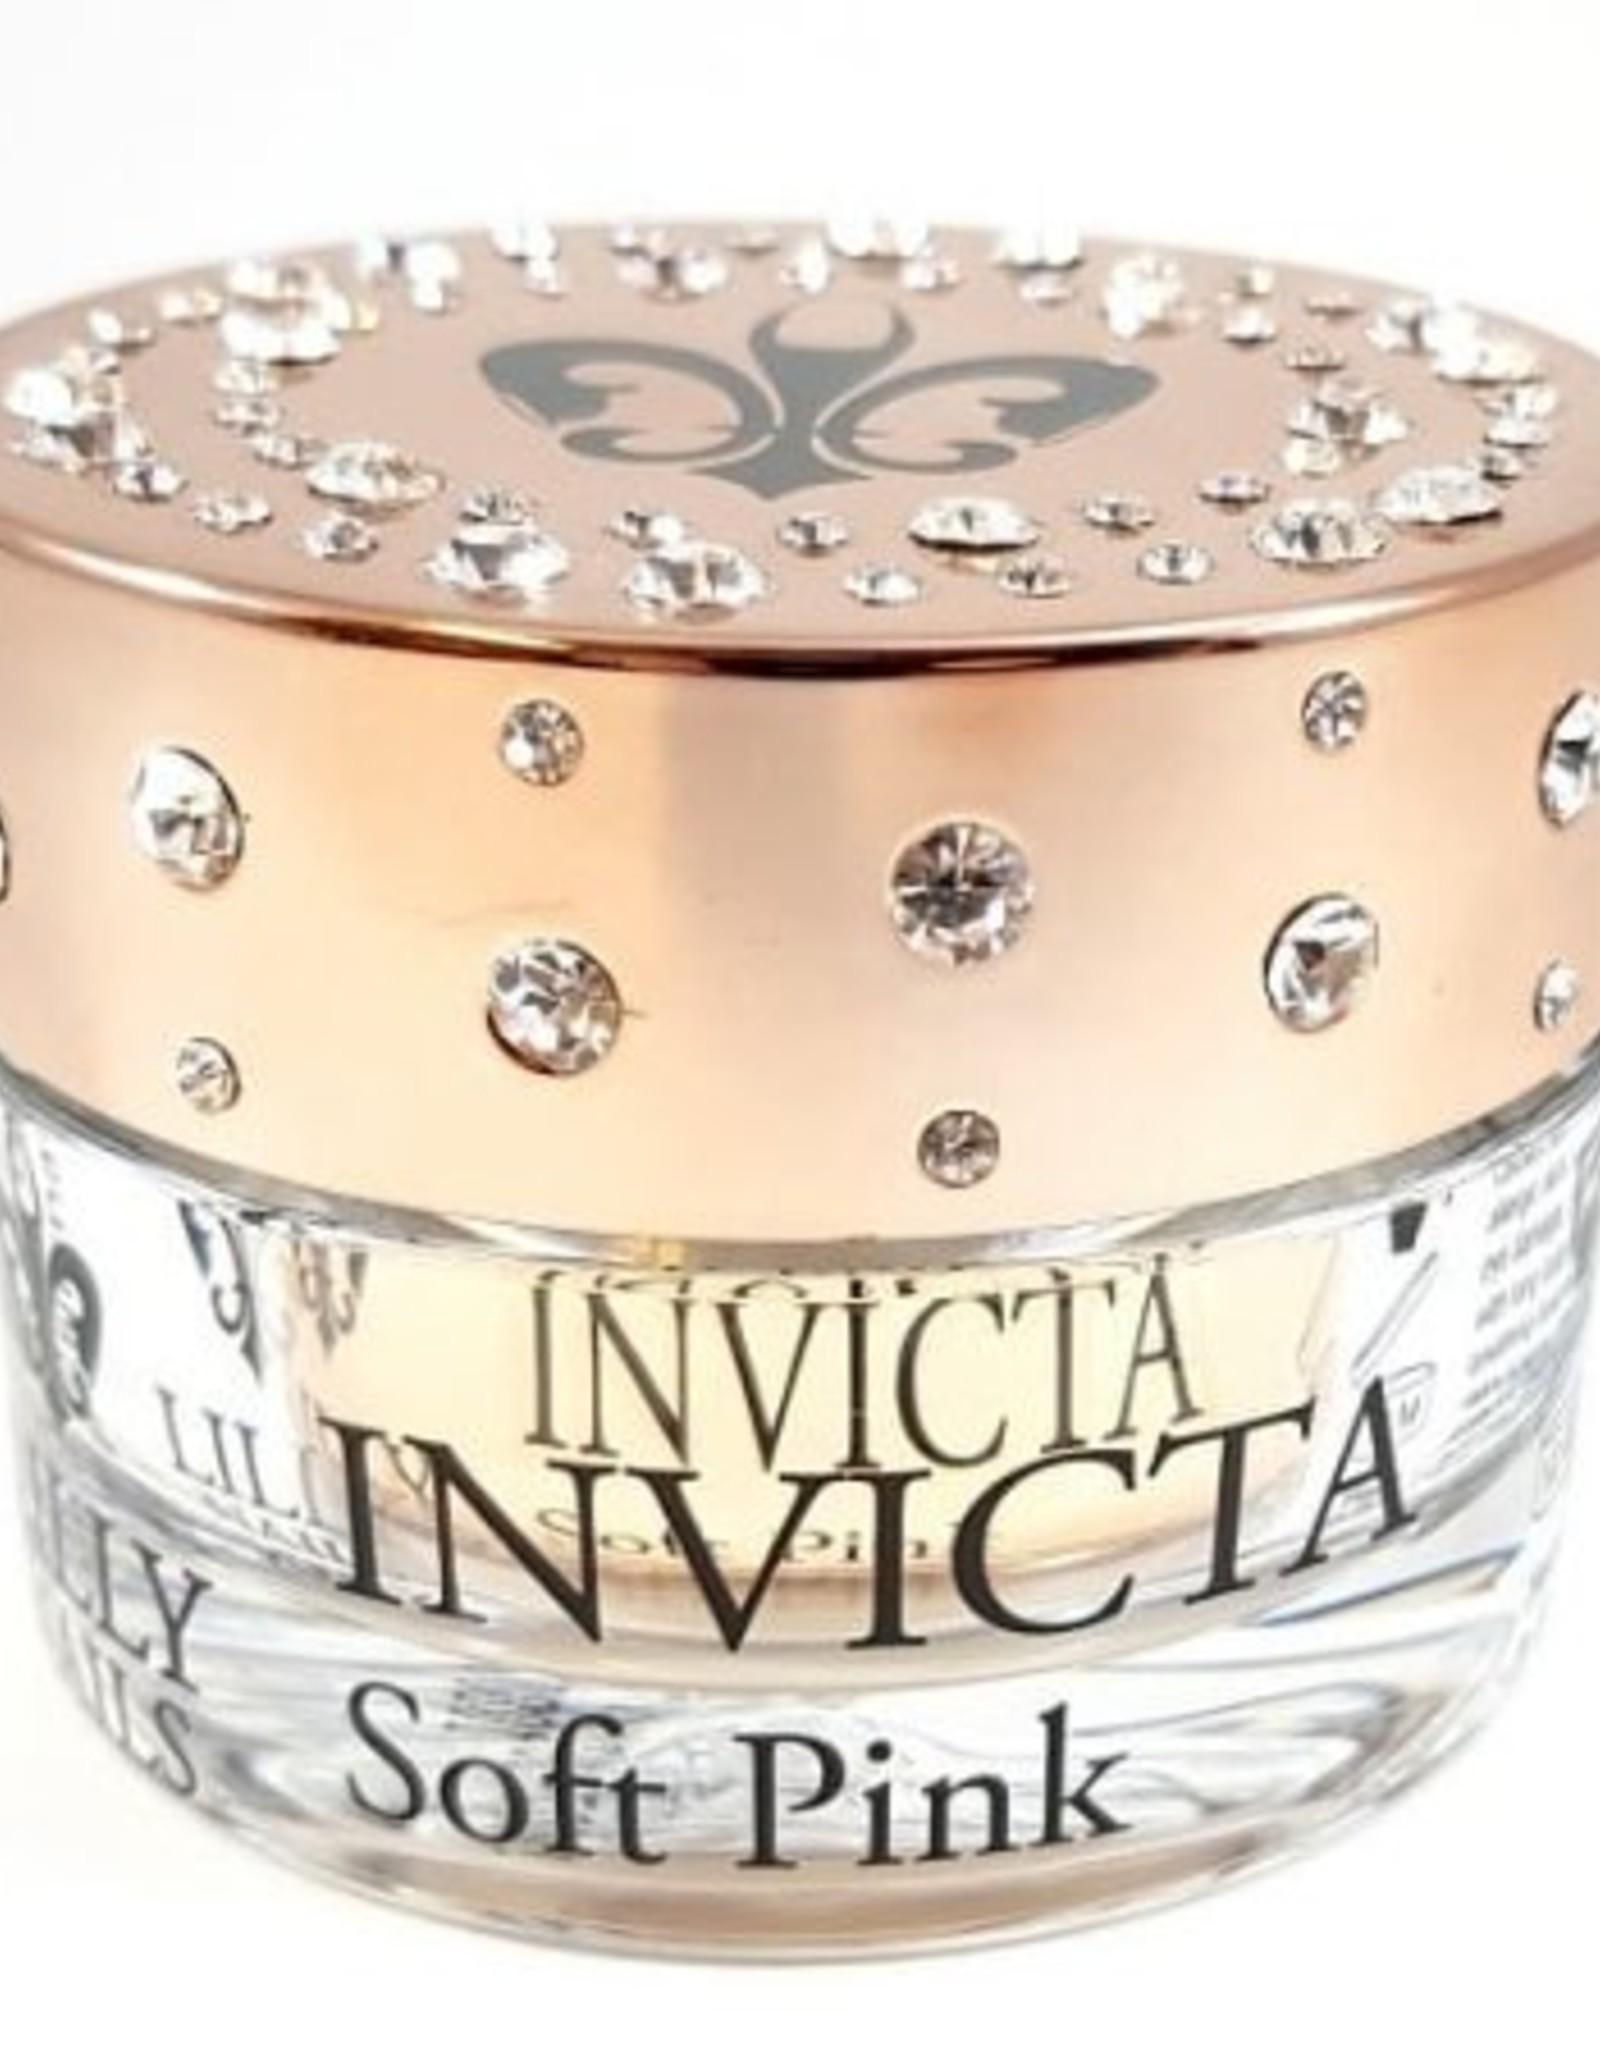 Invicta Soft Pink